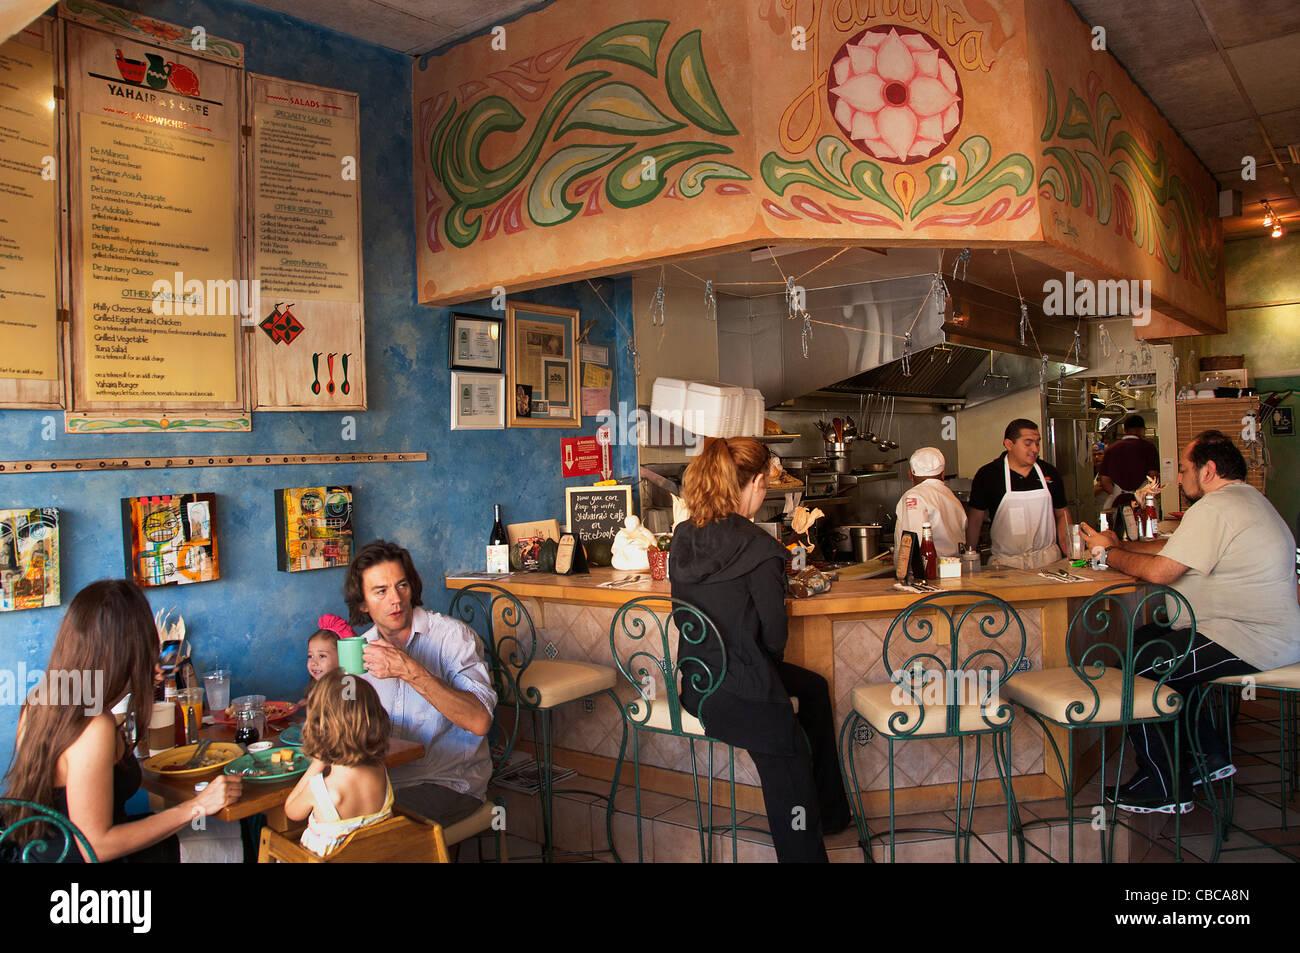 Yahaira S Cafe